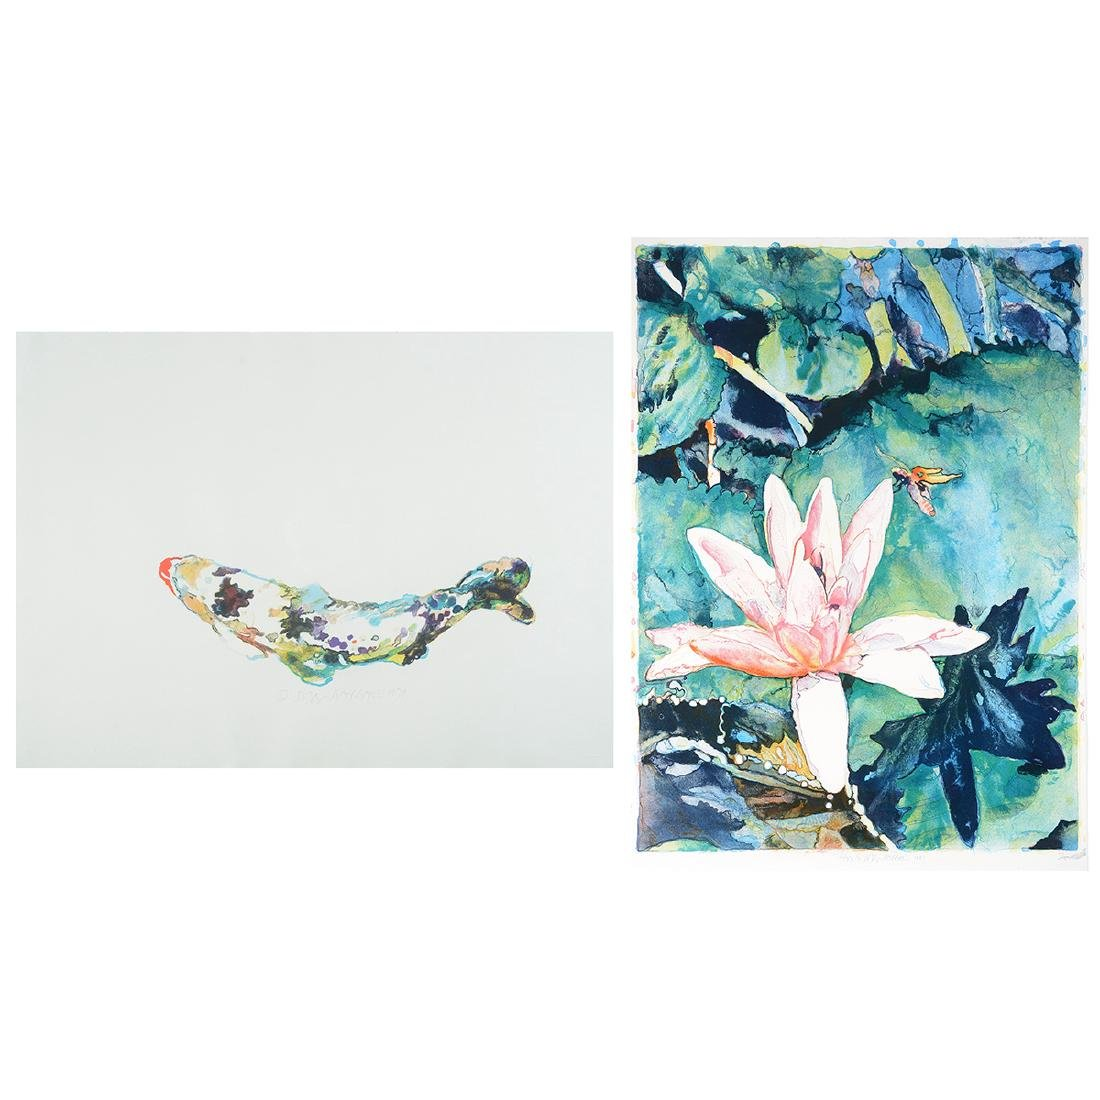 Joseph Raffael, Water lilies & Haiku Fish III lithos